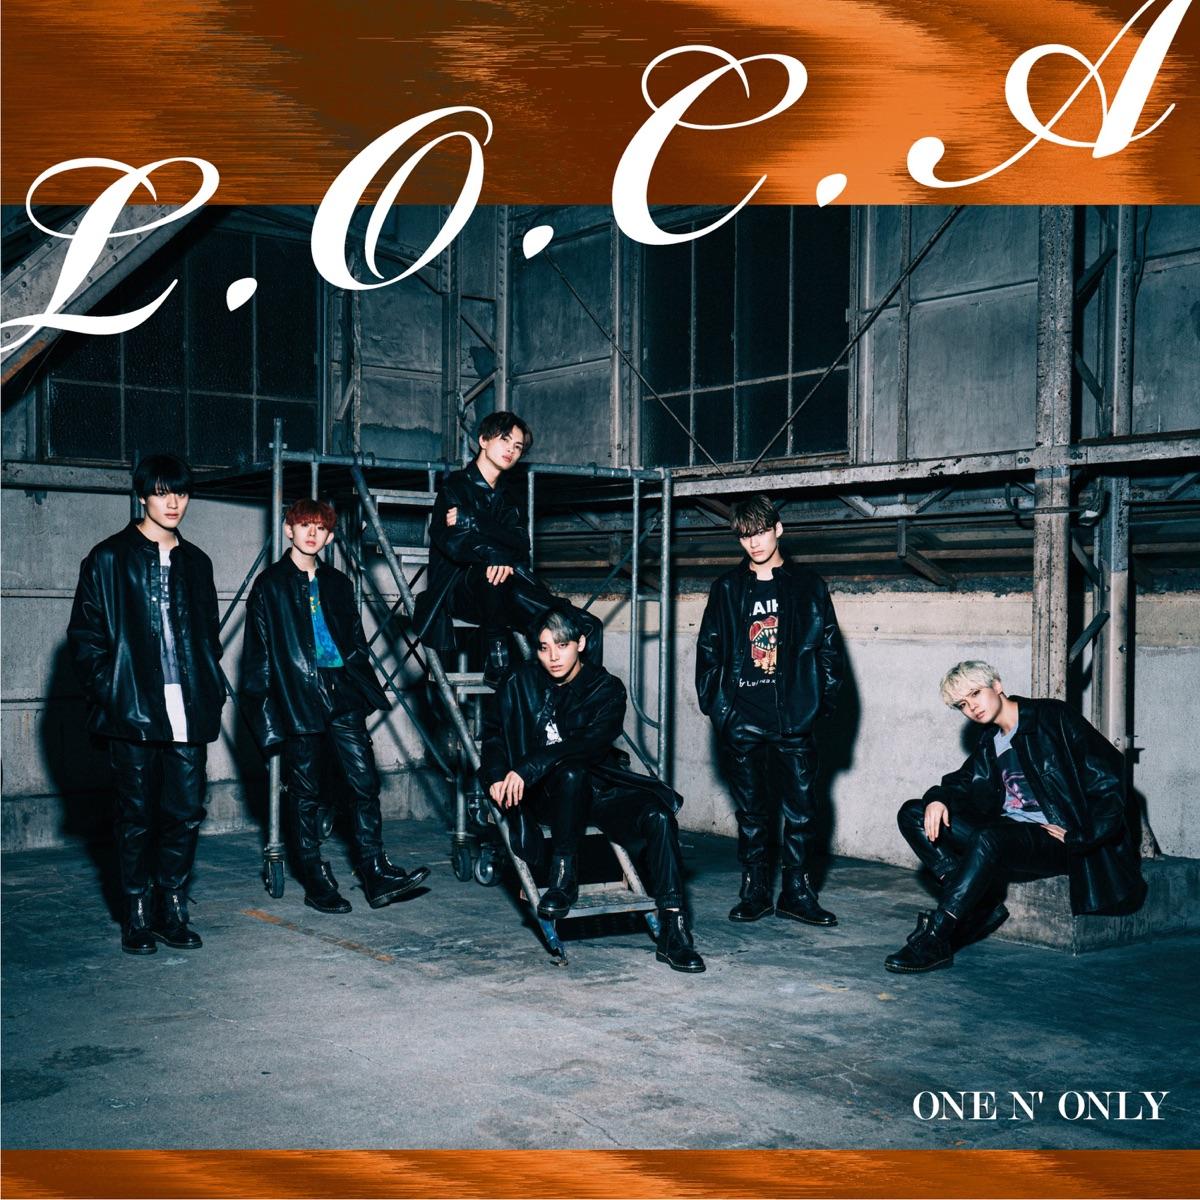 『ONE N' ONLY - L.O.C.A 歌詞』収録の『L.O.C.A』ジャケット